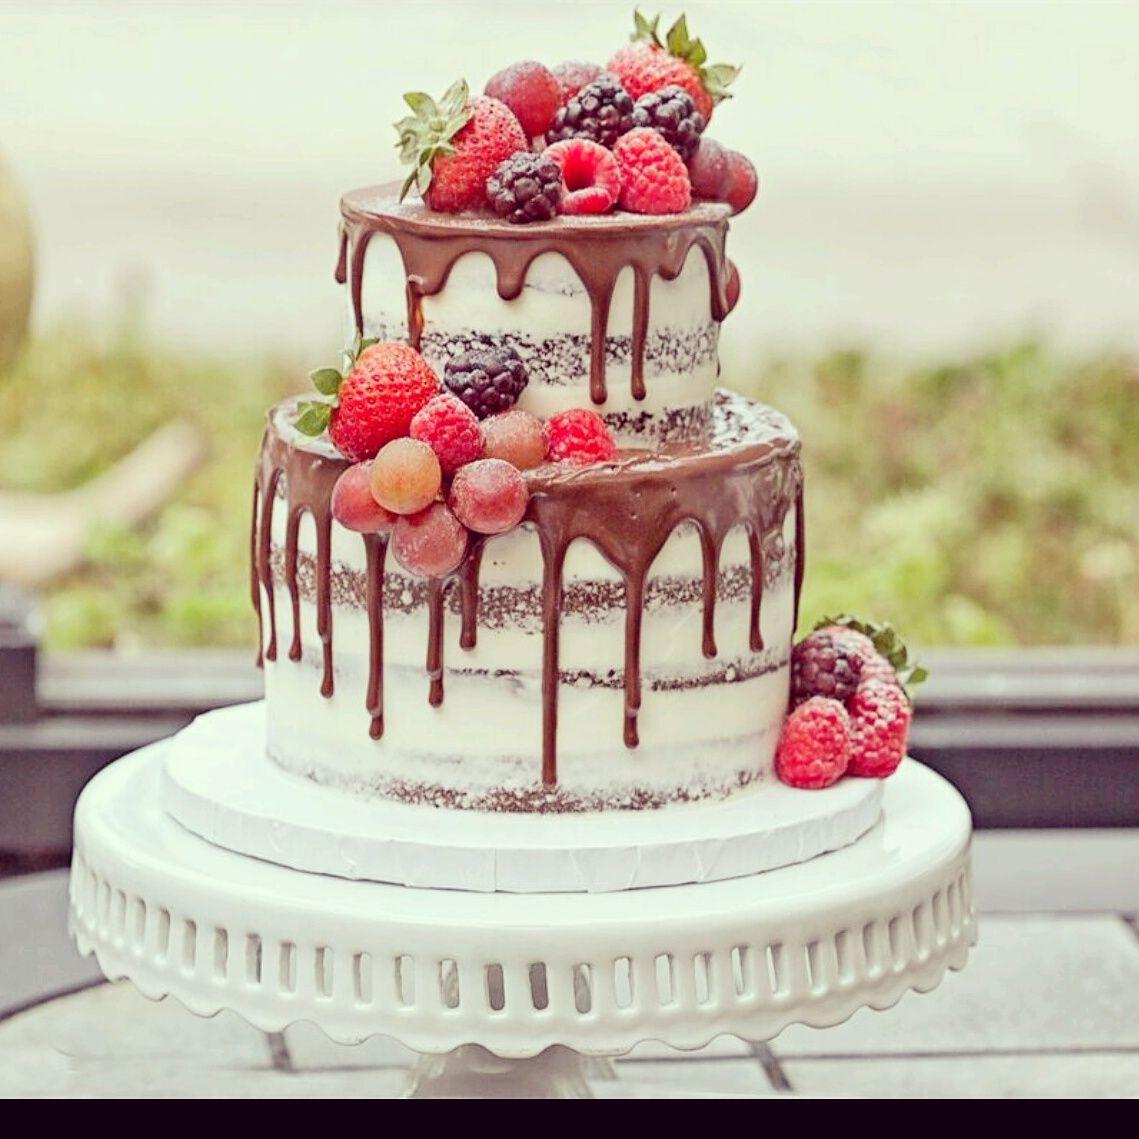 Naked Cake with Chocolate Drip